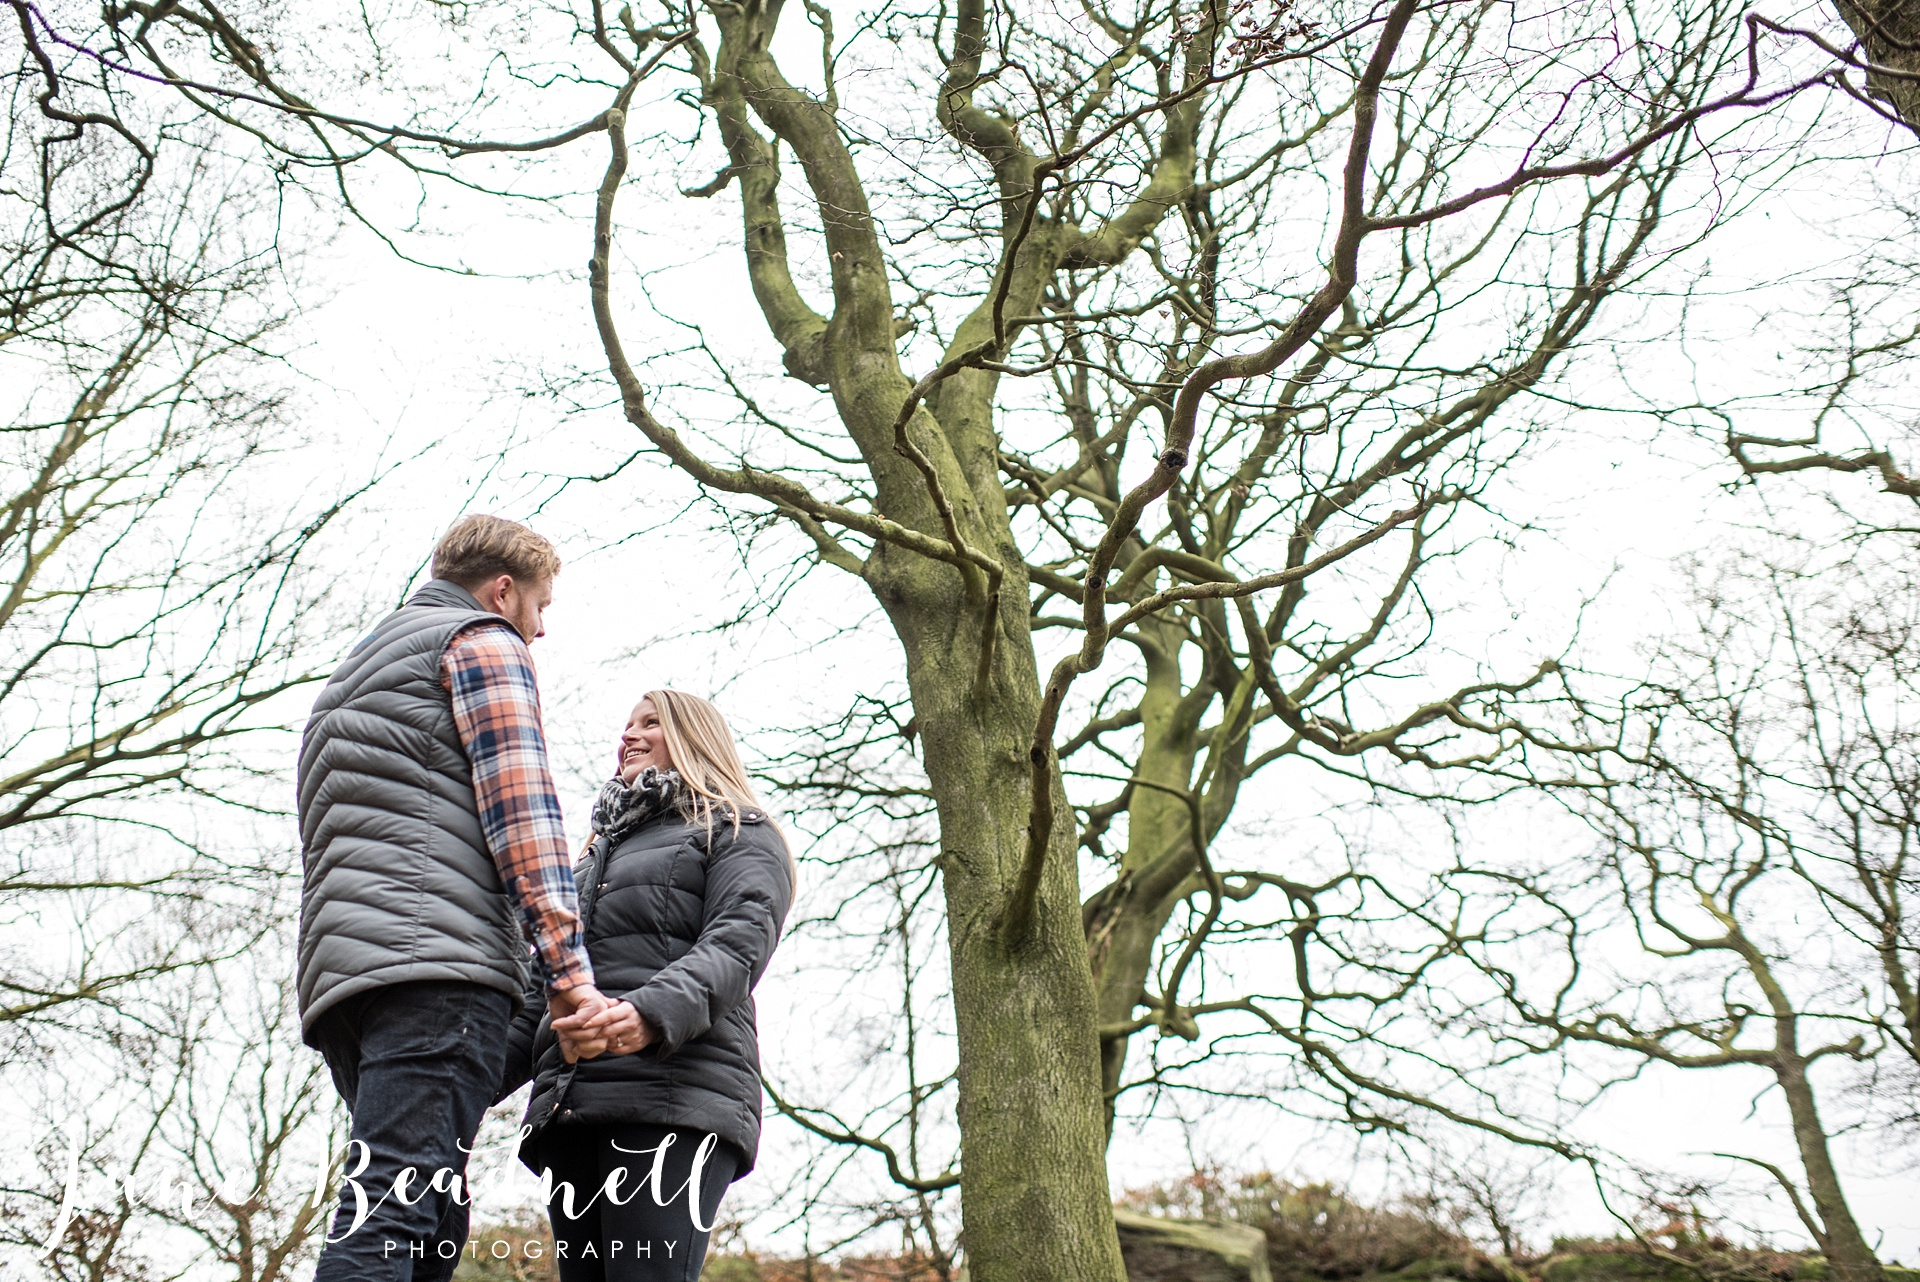 yorkshire-wedding-photographer-jane-beadnell-photography-uk-and-destination-wedding-photographer-engagement-shoot_0030